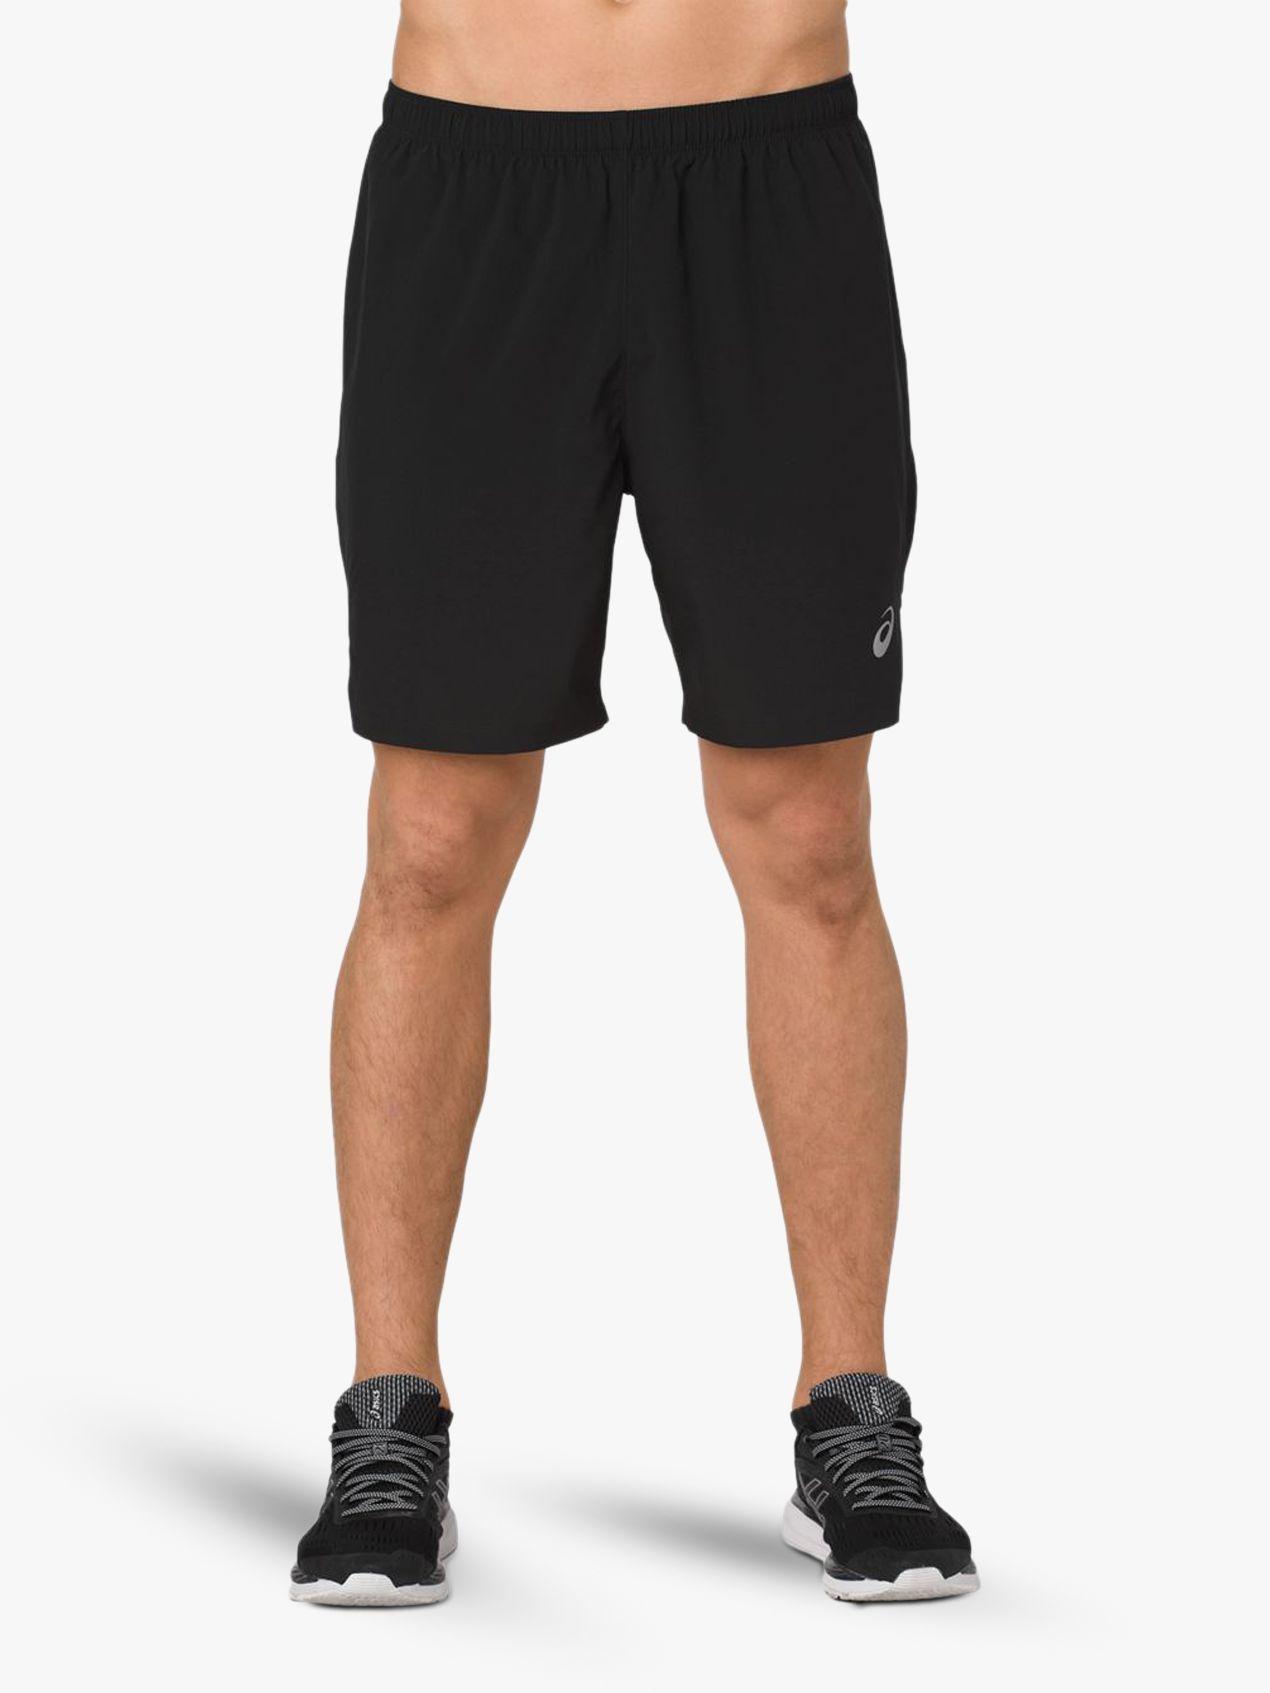 ASICS ASICS Silver 2-in-1 Running Shorts, Performance Black